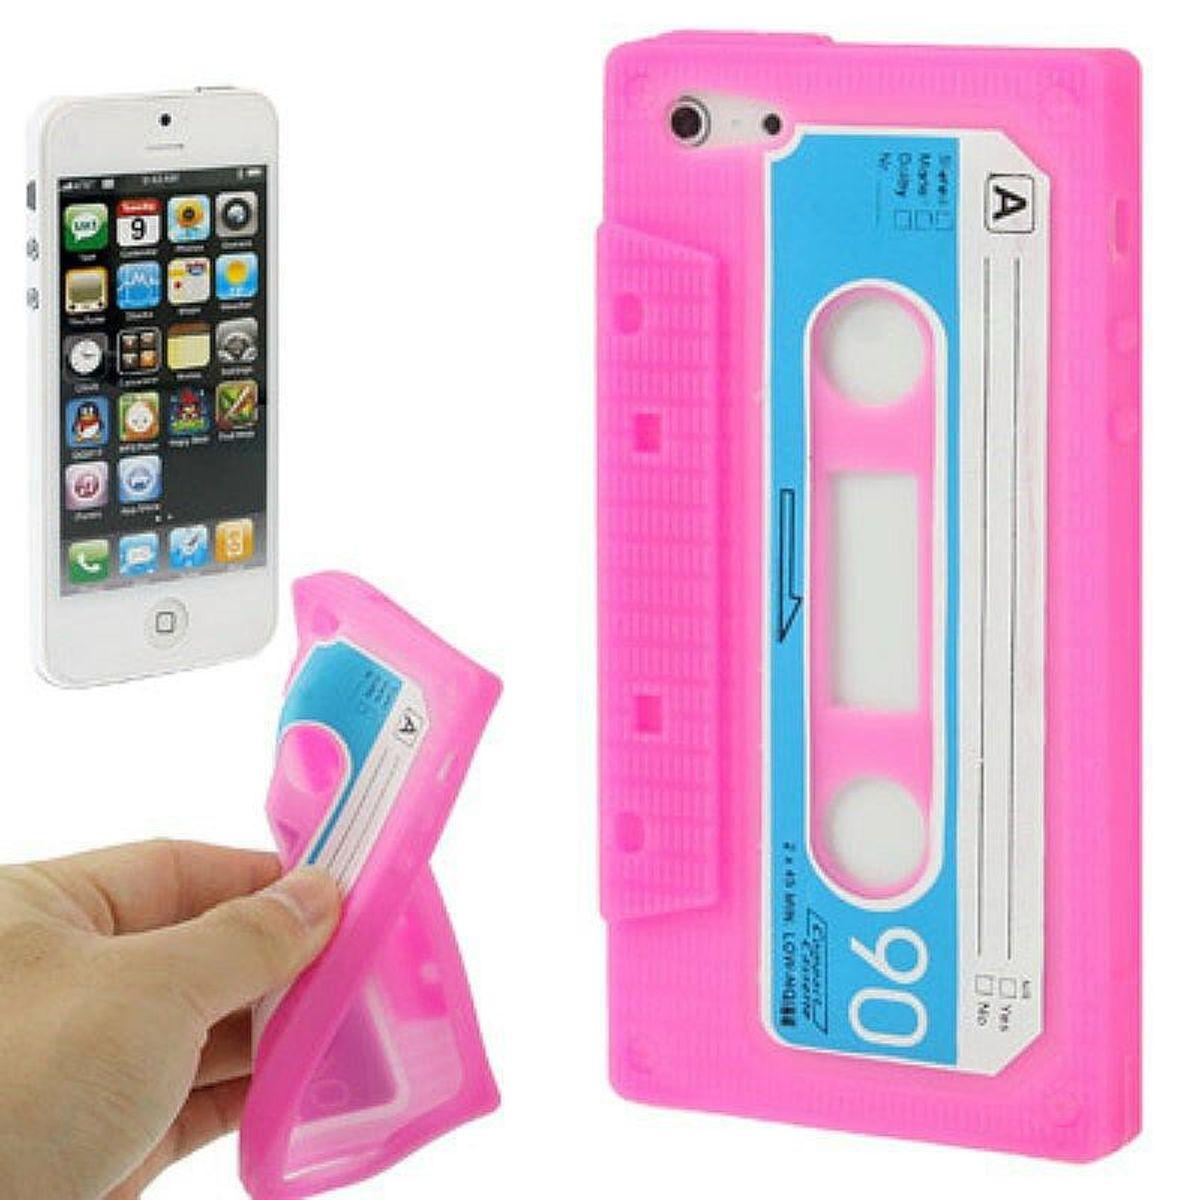 Silikon Hülle Retro Kassette für Handy iPhone 5 / 5s Pink